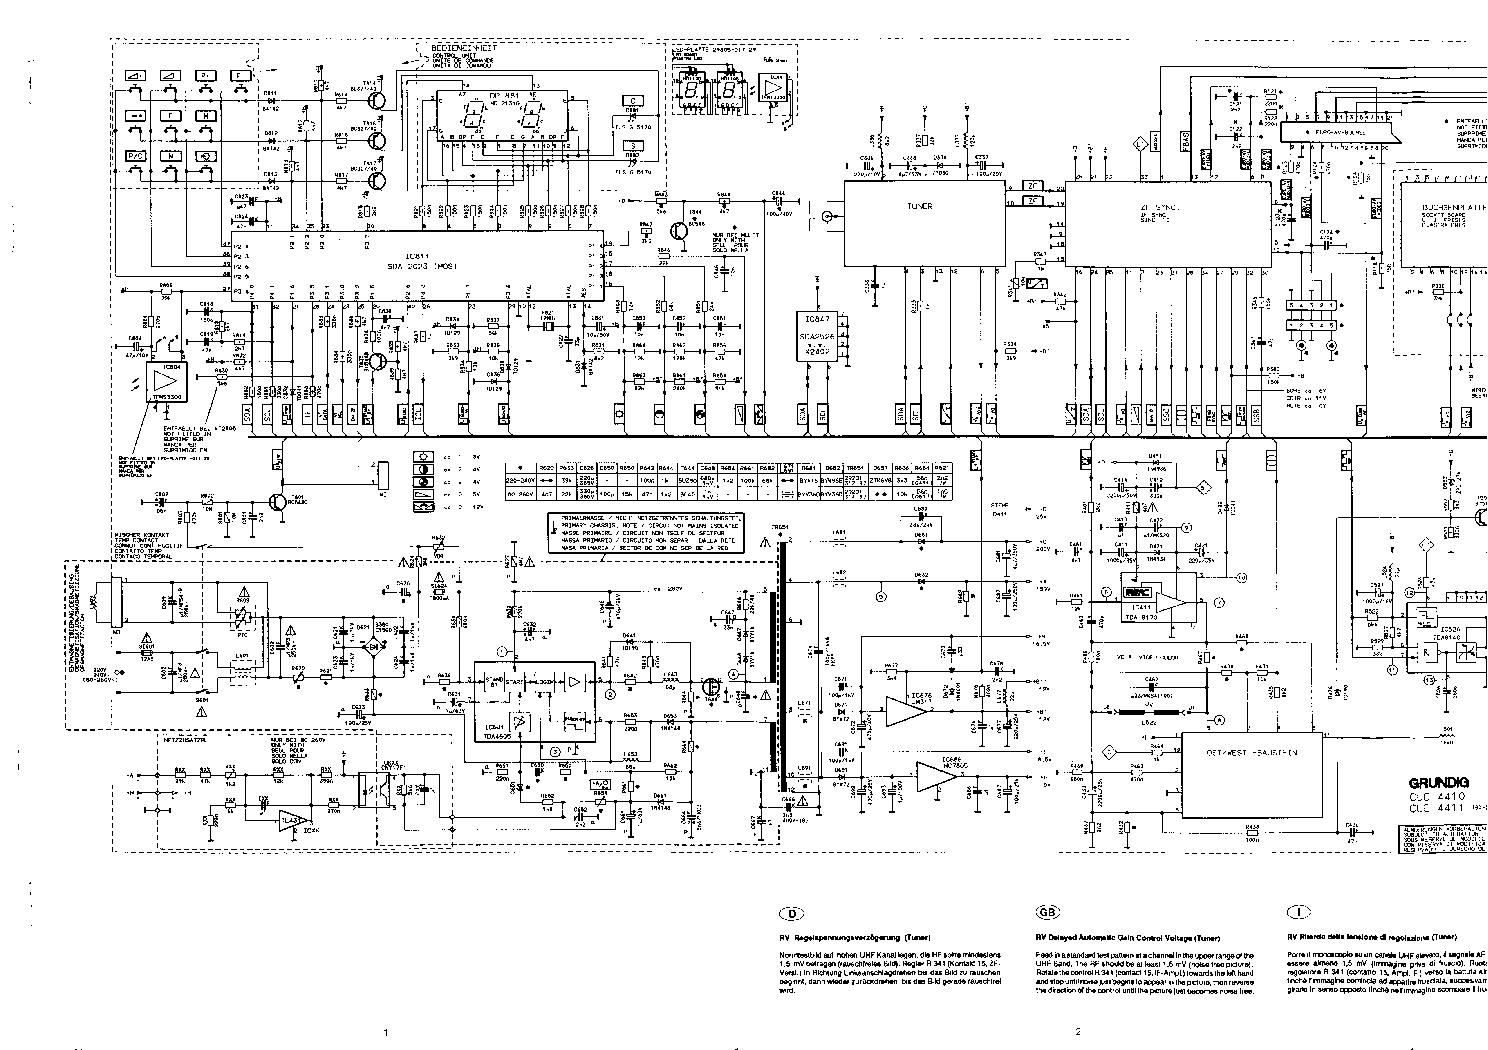 GRUNDIG CUC-4410 SCH service manual (1st page)